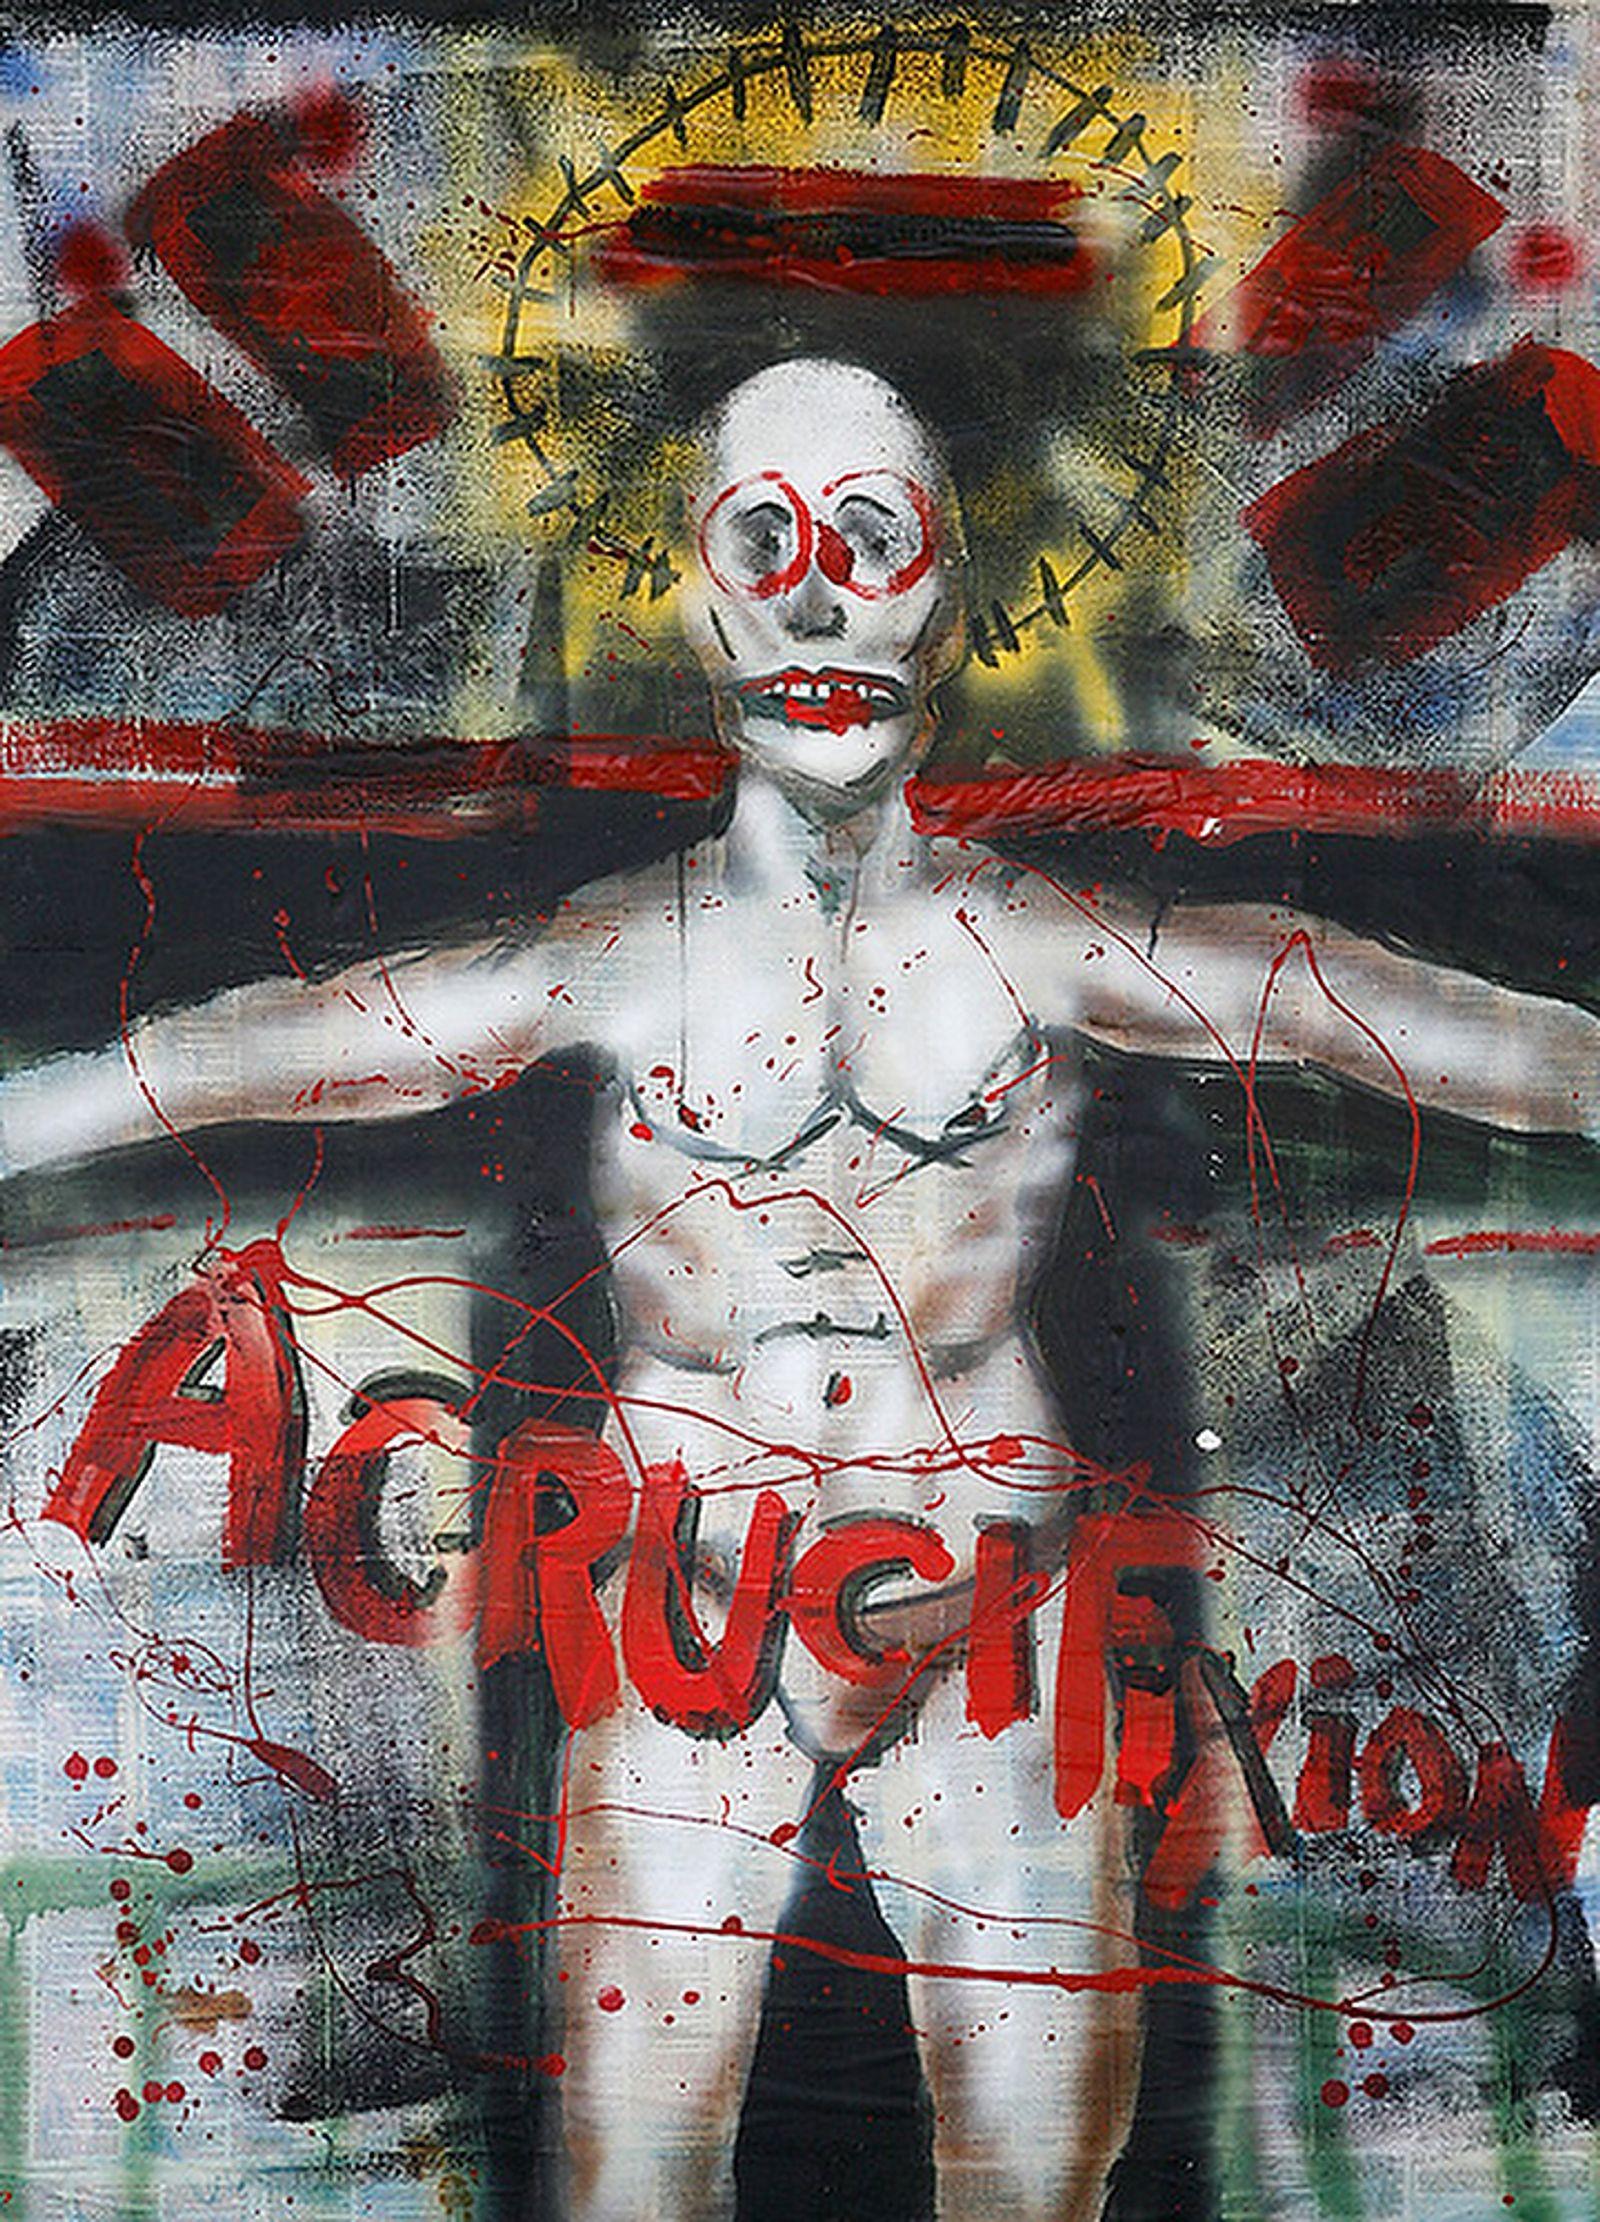 Acrucifixion